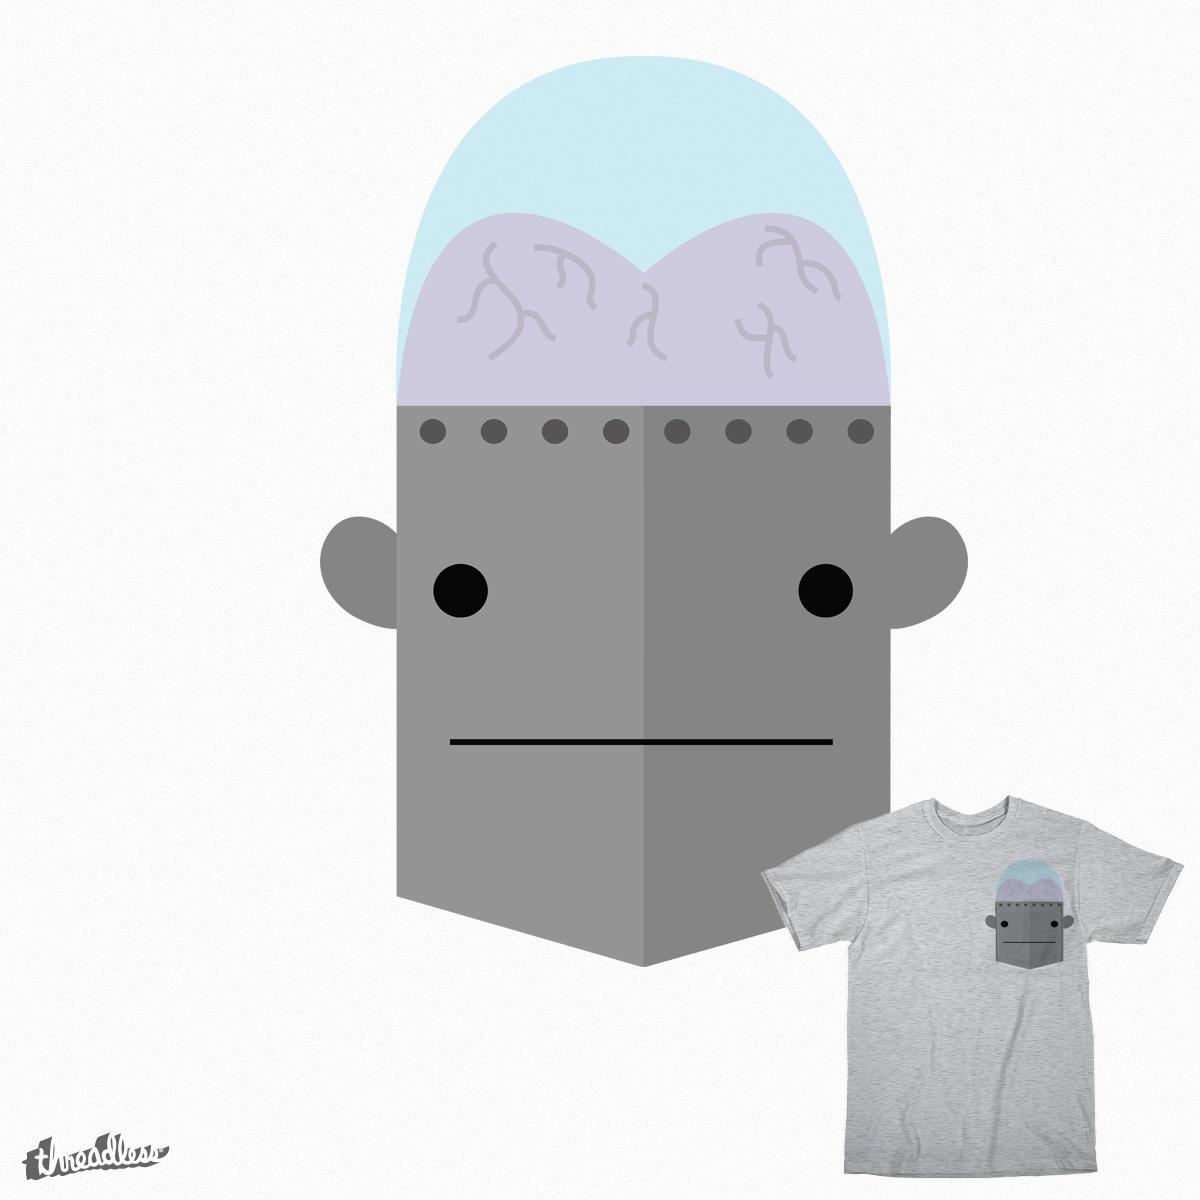 Derp Robot by ANadaskay on Threadless